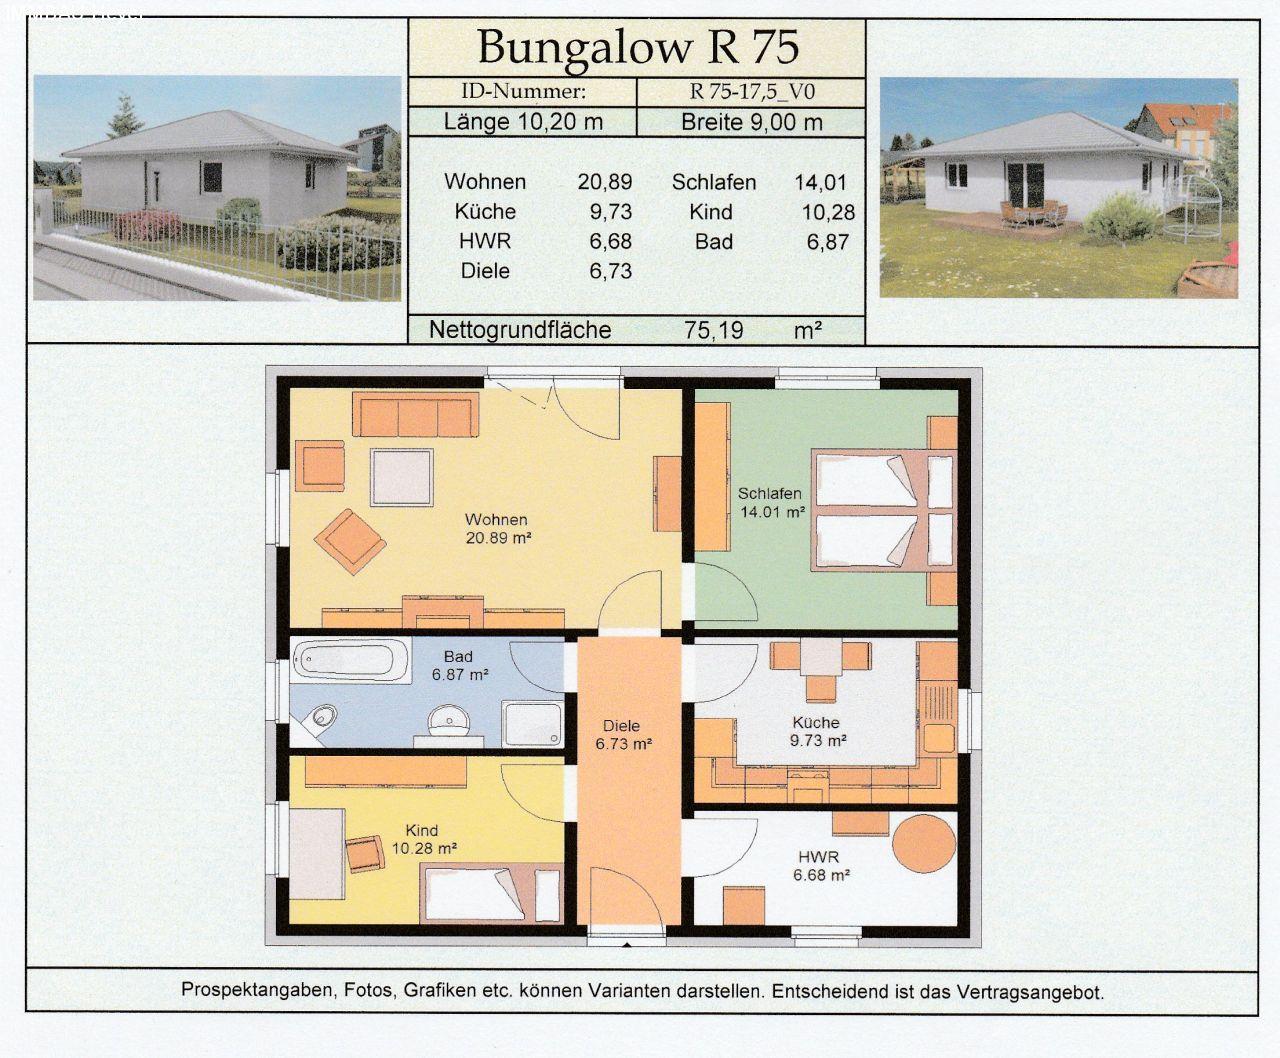 preiswert bauen 24 programm ludwigsfelde bungalow r 75. Black Bedroom Furniture Sets. Home Design Ideas